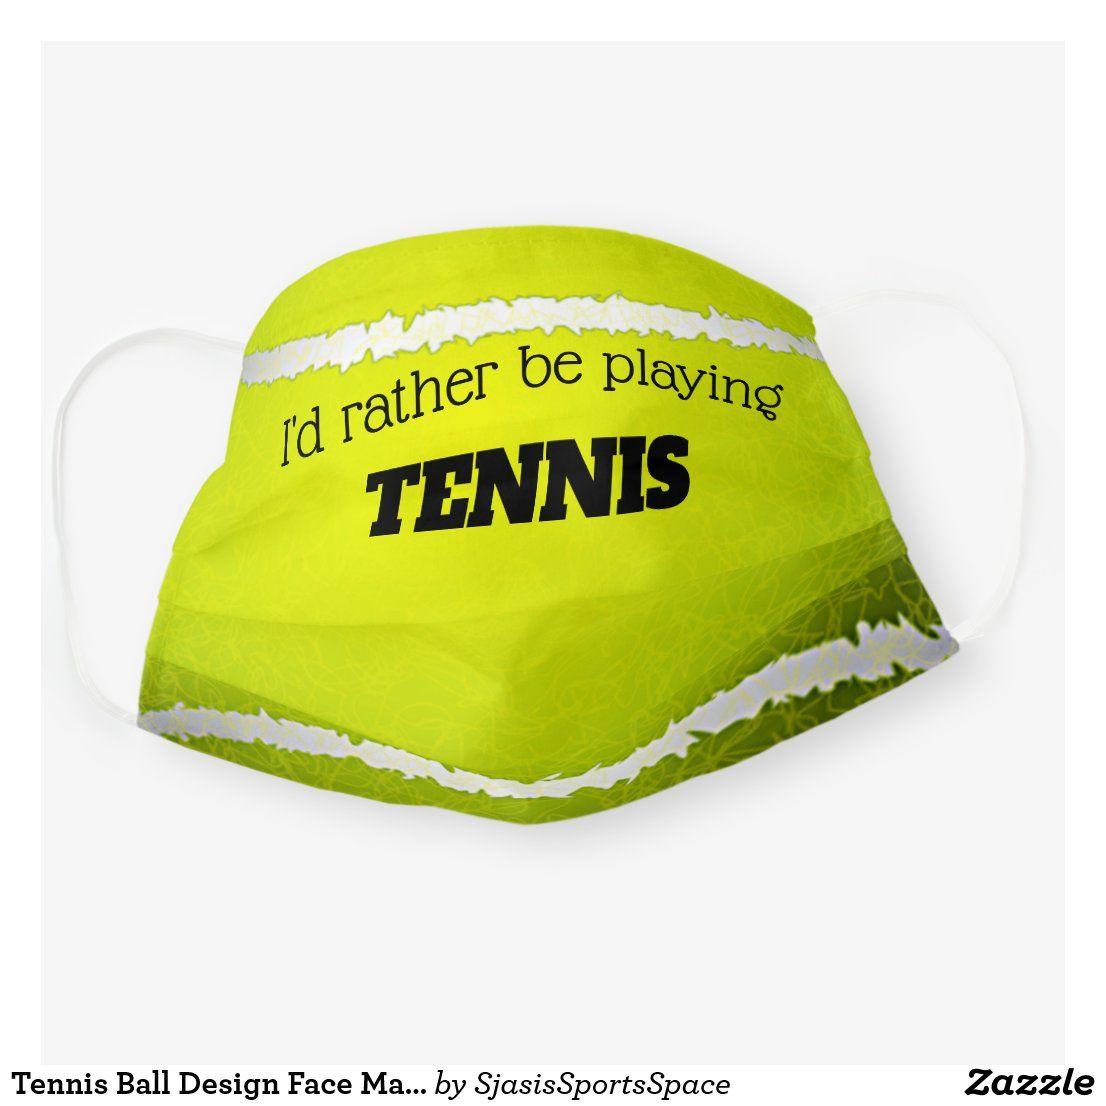 Tennis Ball Design Face Mask Zazzle Com In 2020 Face Mask Diy Face Mask Tennis Ball